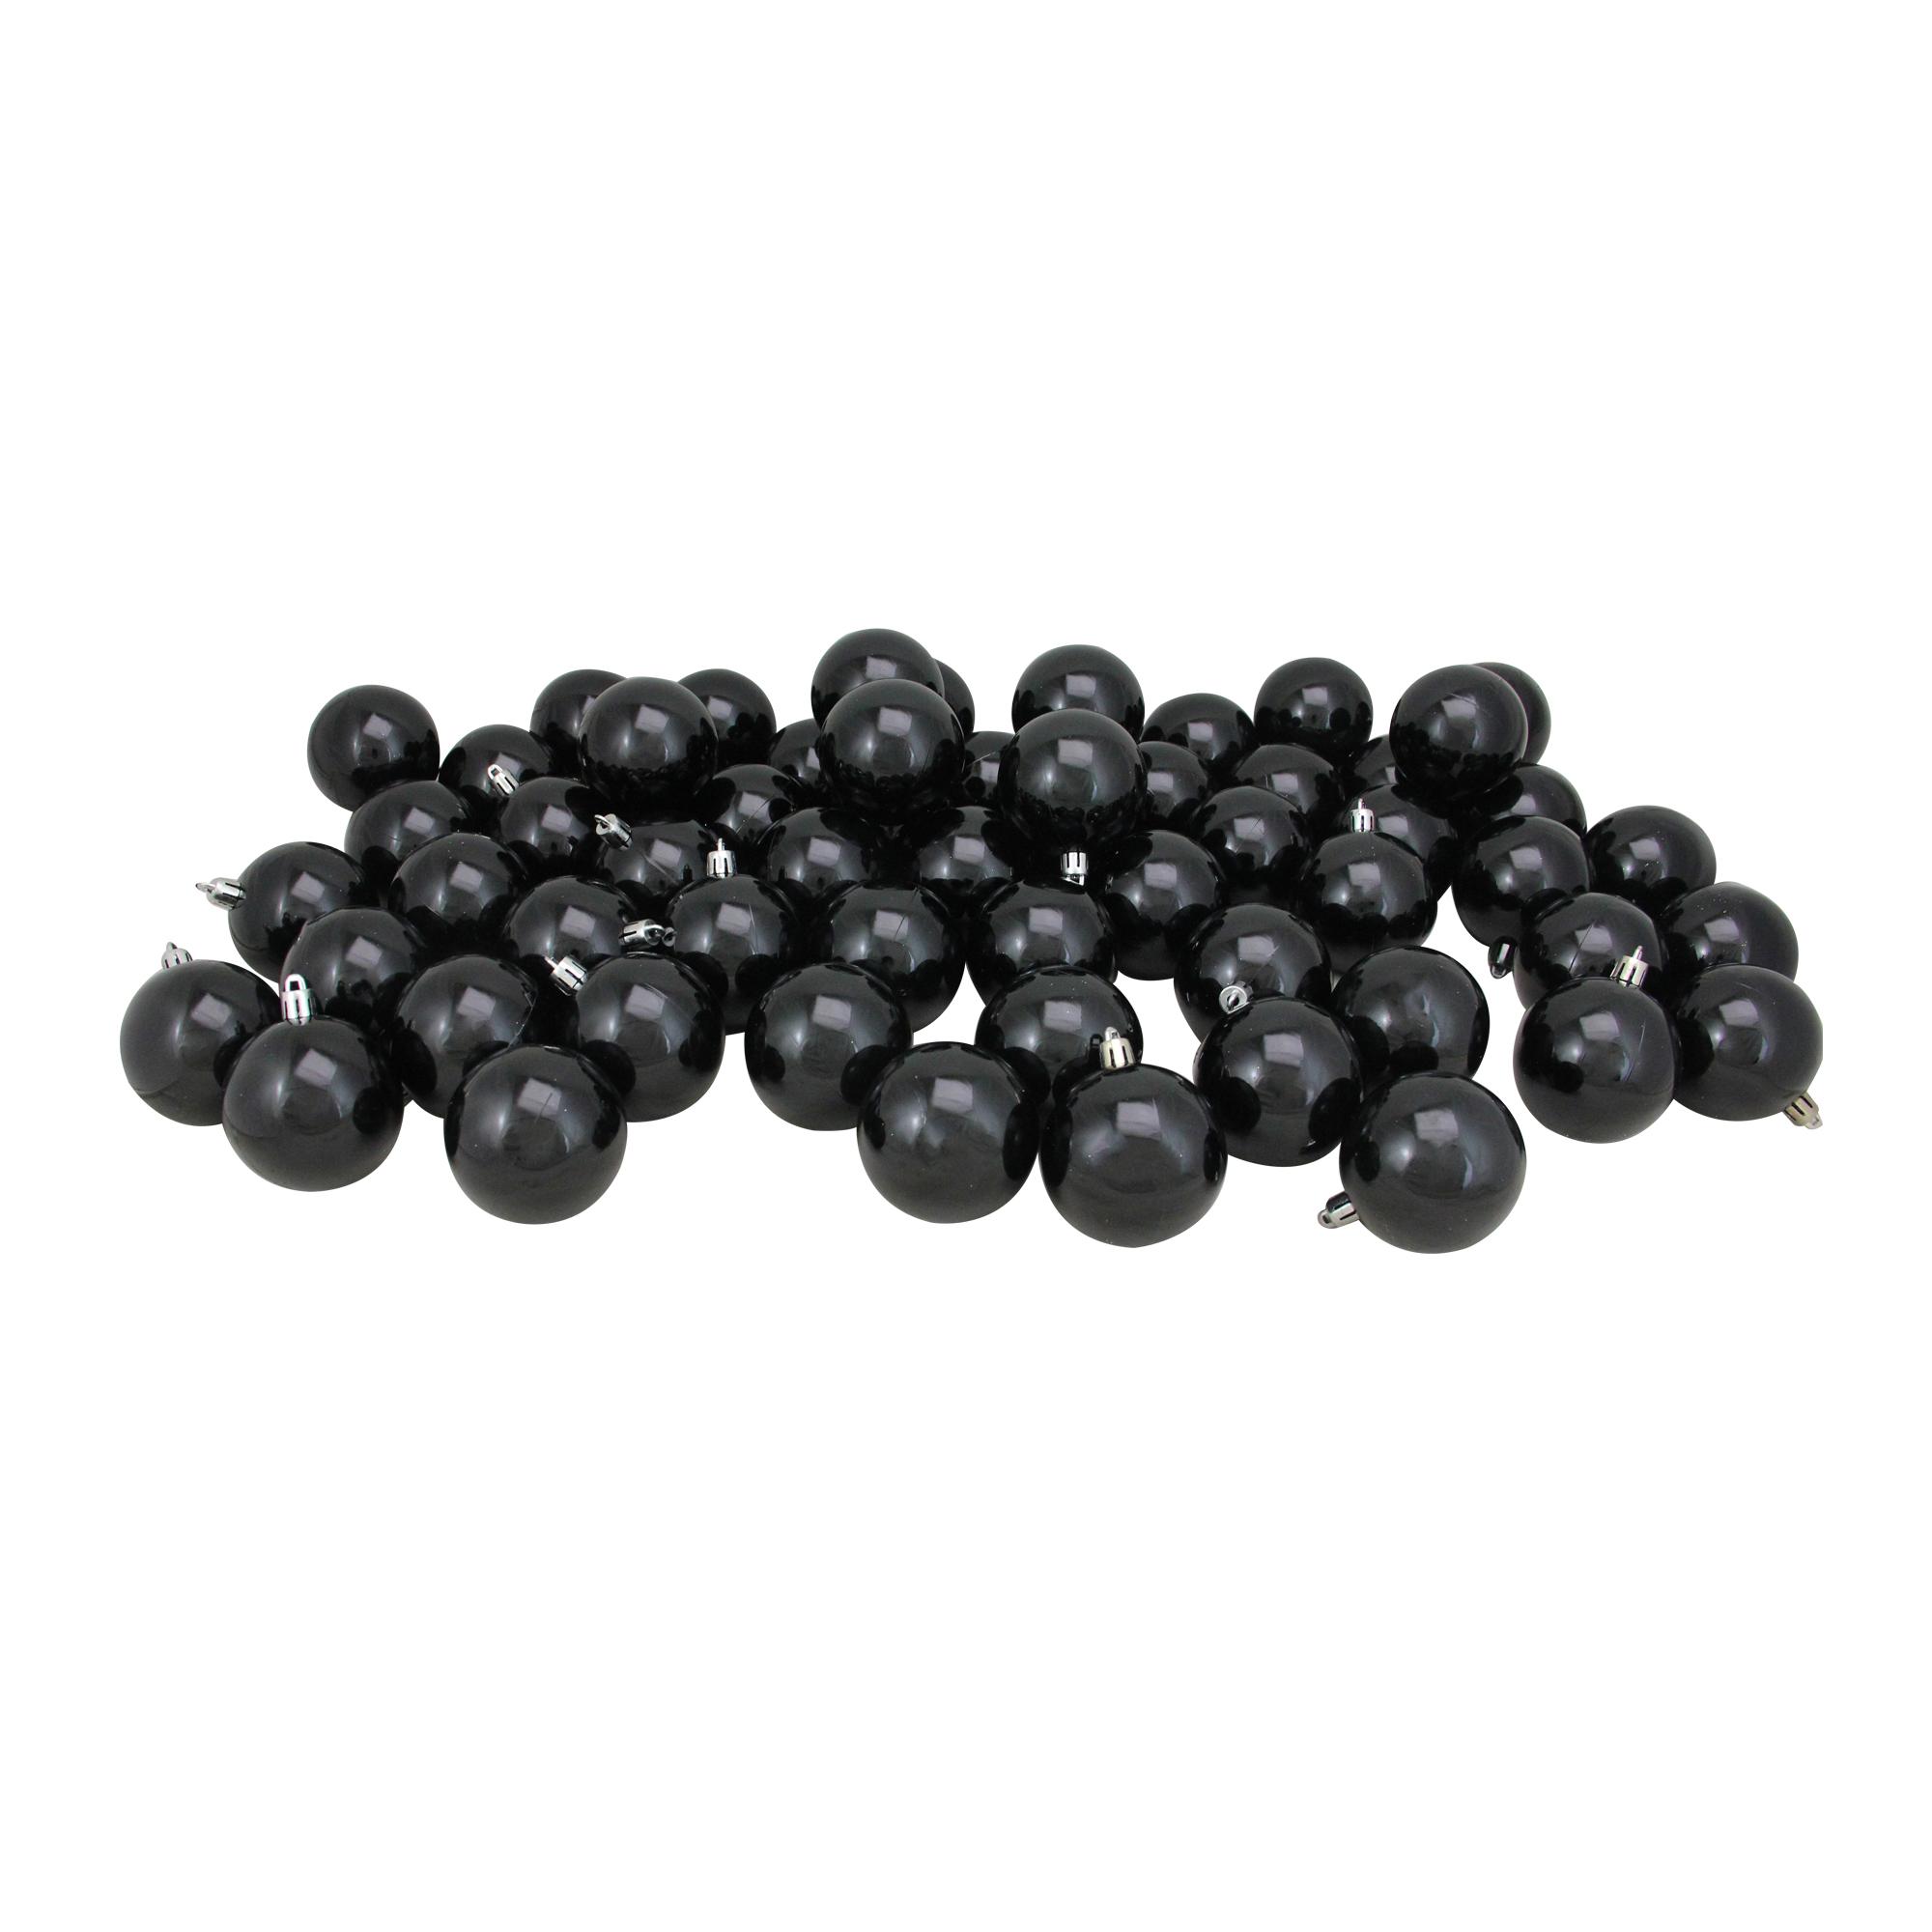 "60ct Jet Black Shatterproof Shiny Christmas Ball Ornaments 2.5"" (60mm)"